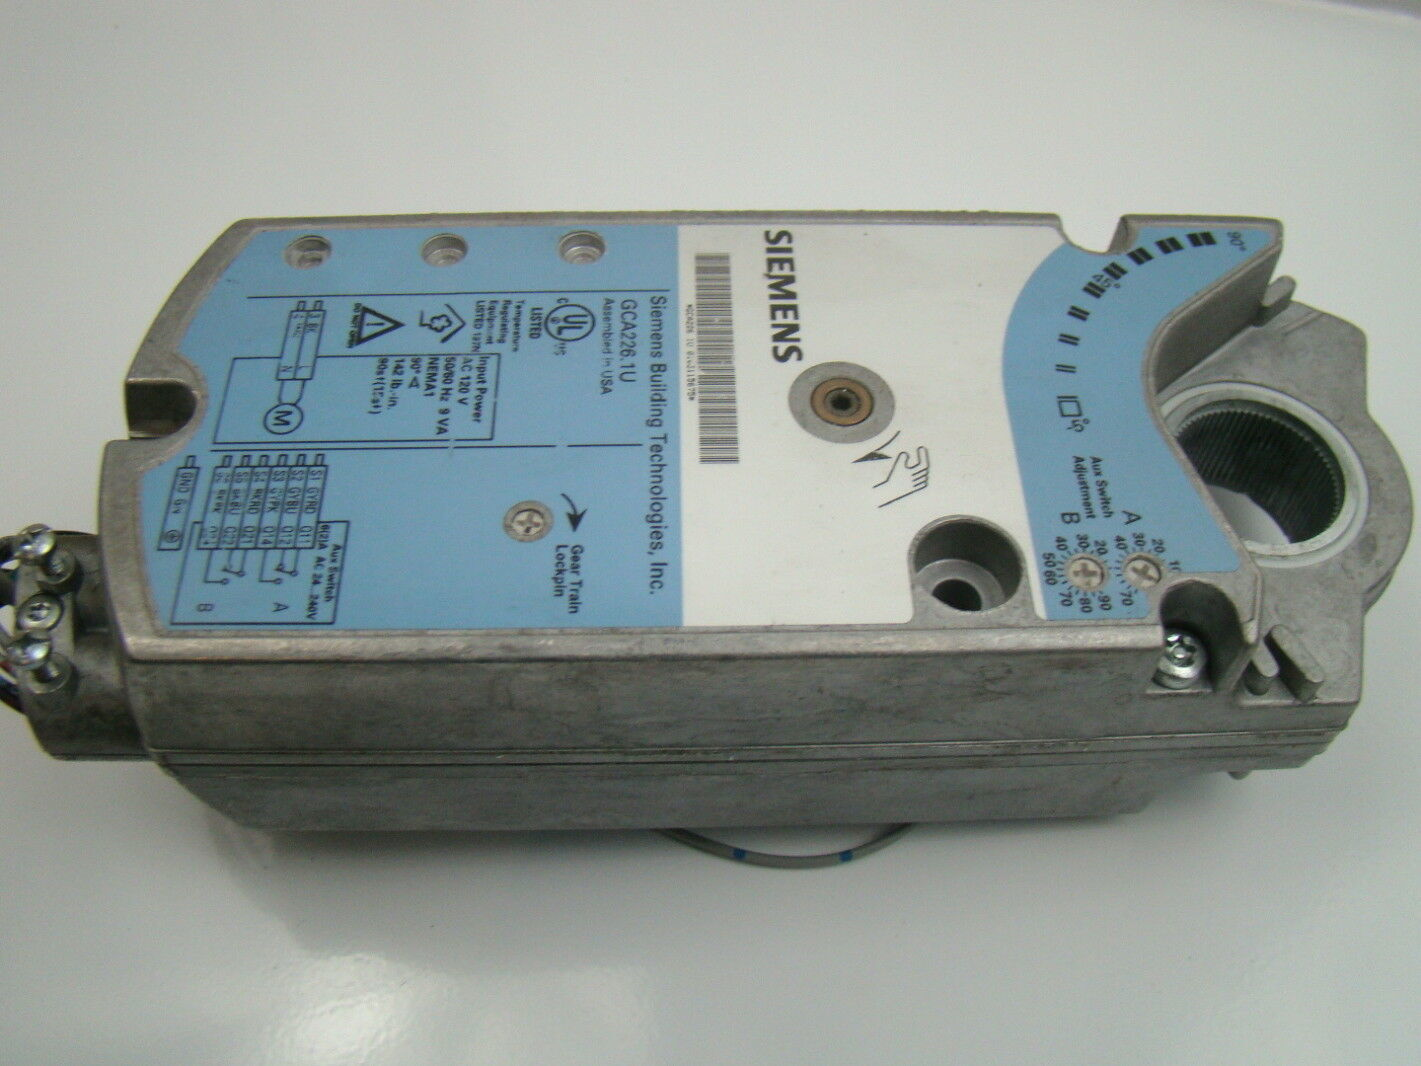 siemens rotarty electronic damper actuator gca226 1u